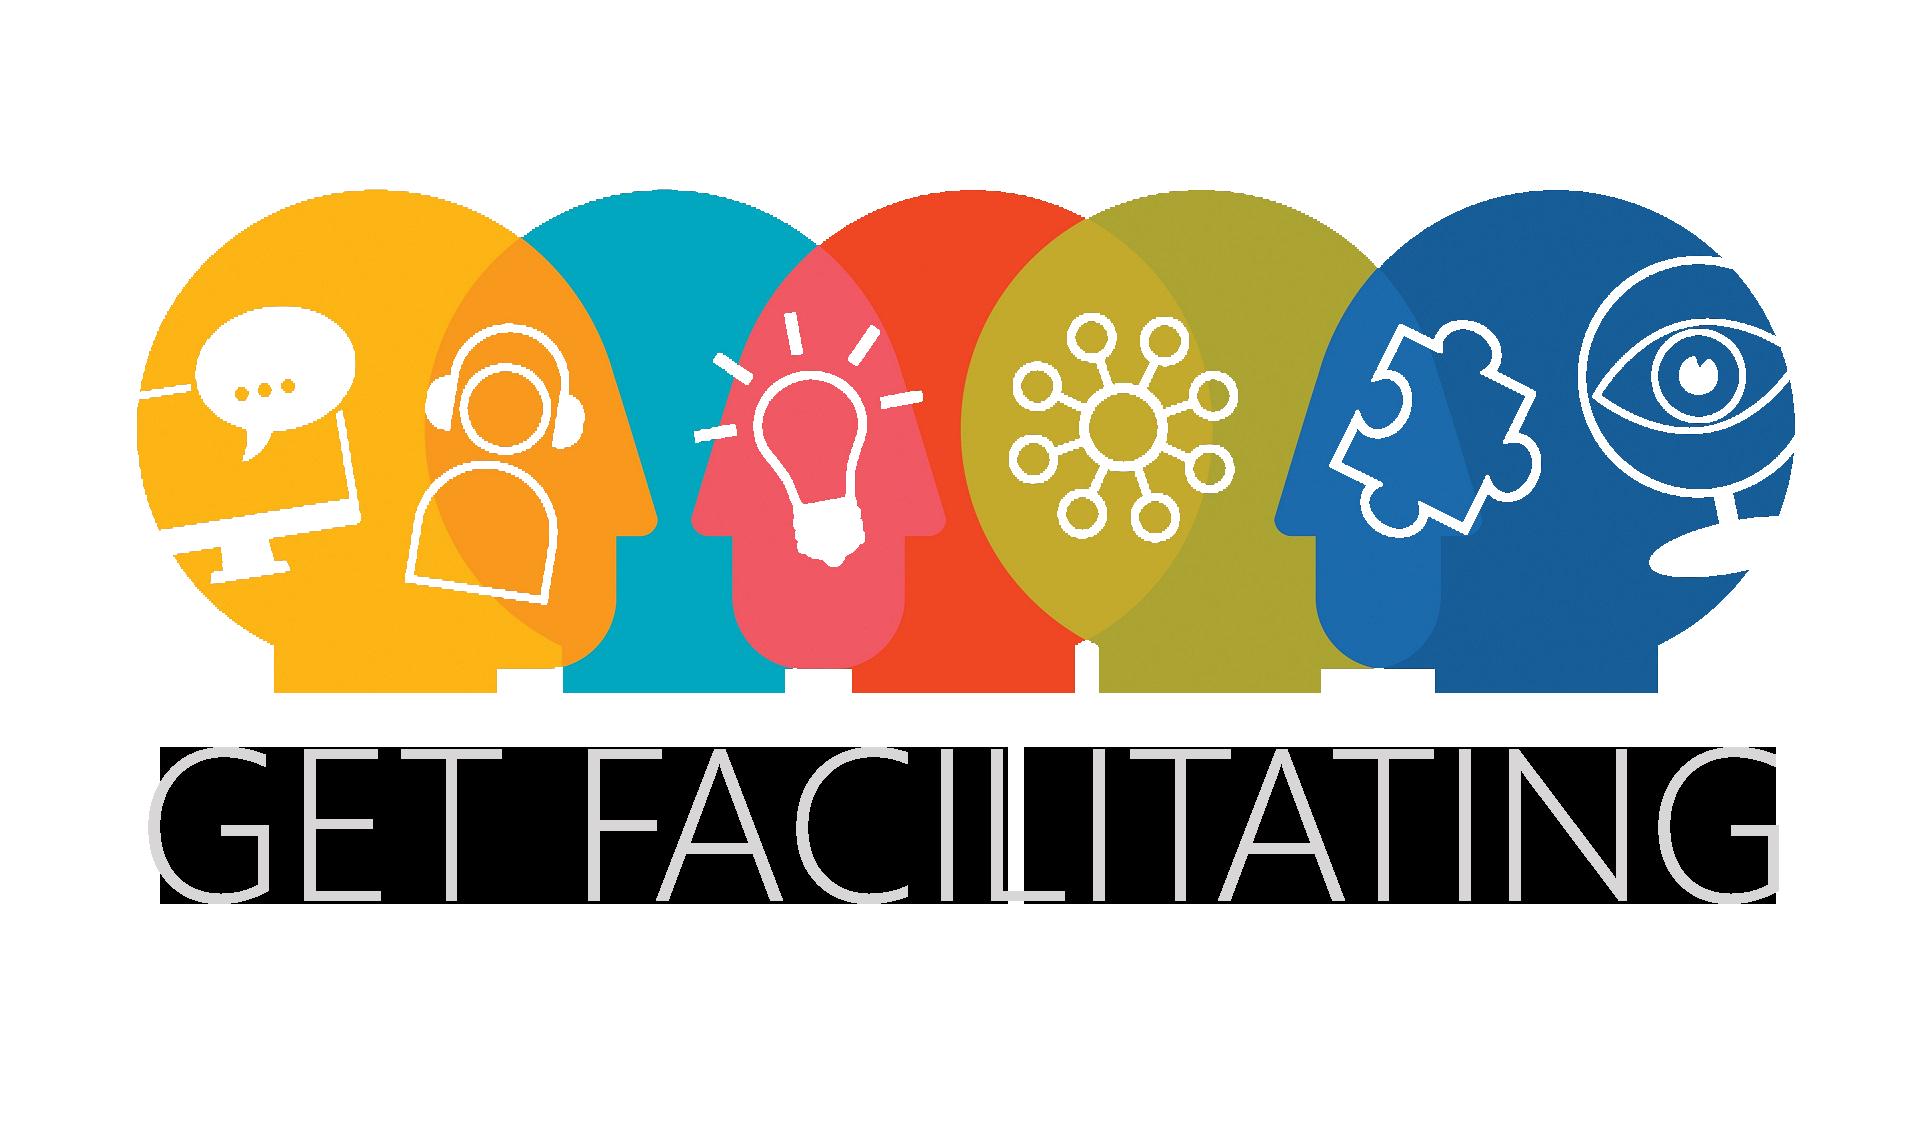 Getfacilitating sharing the best. Trust clipart facilitation